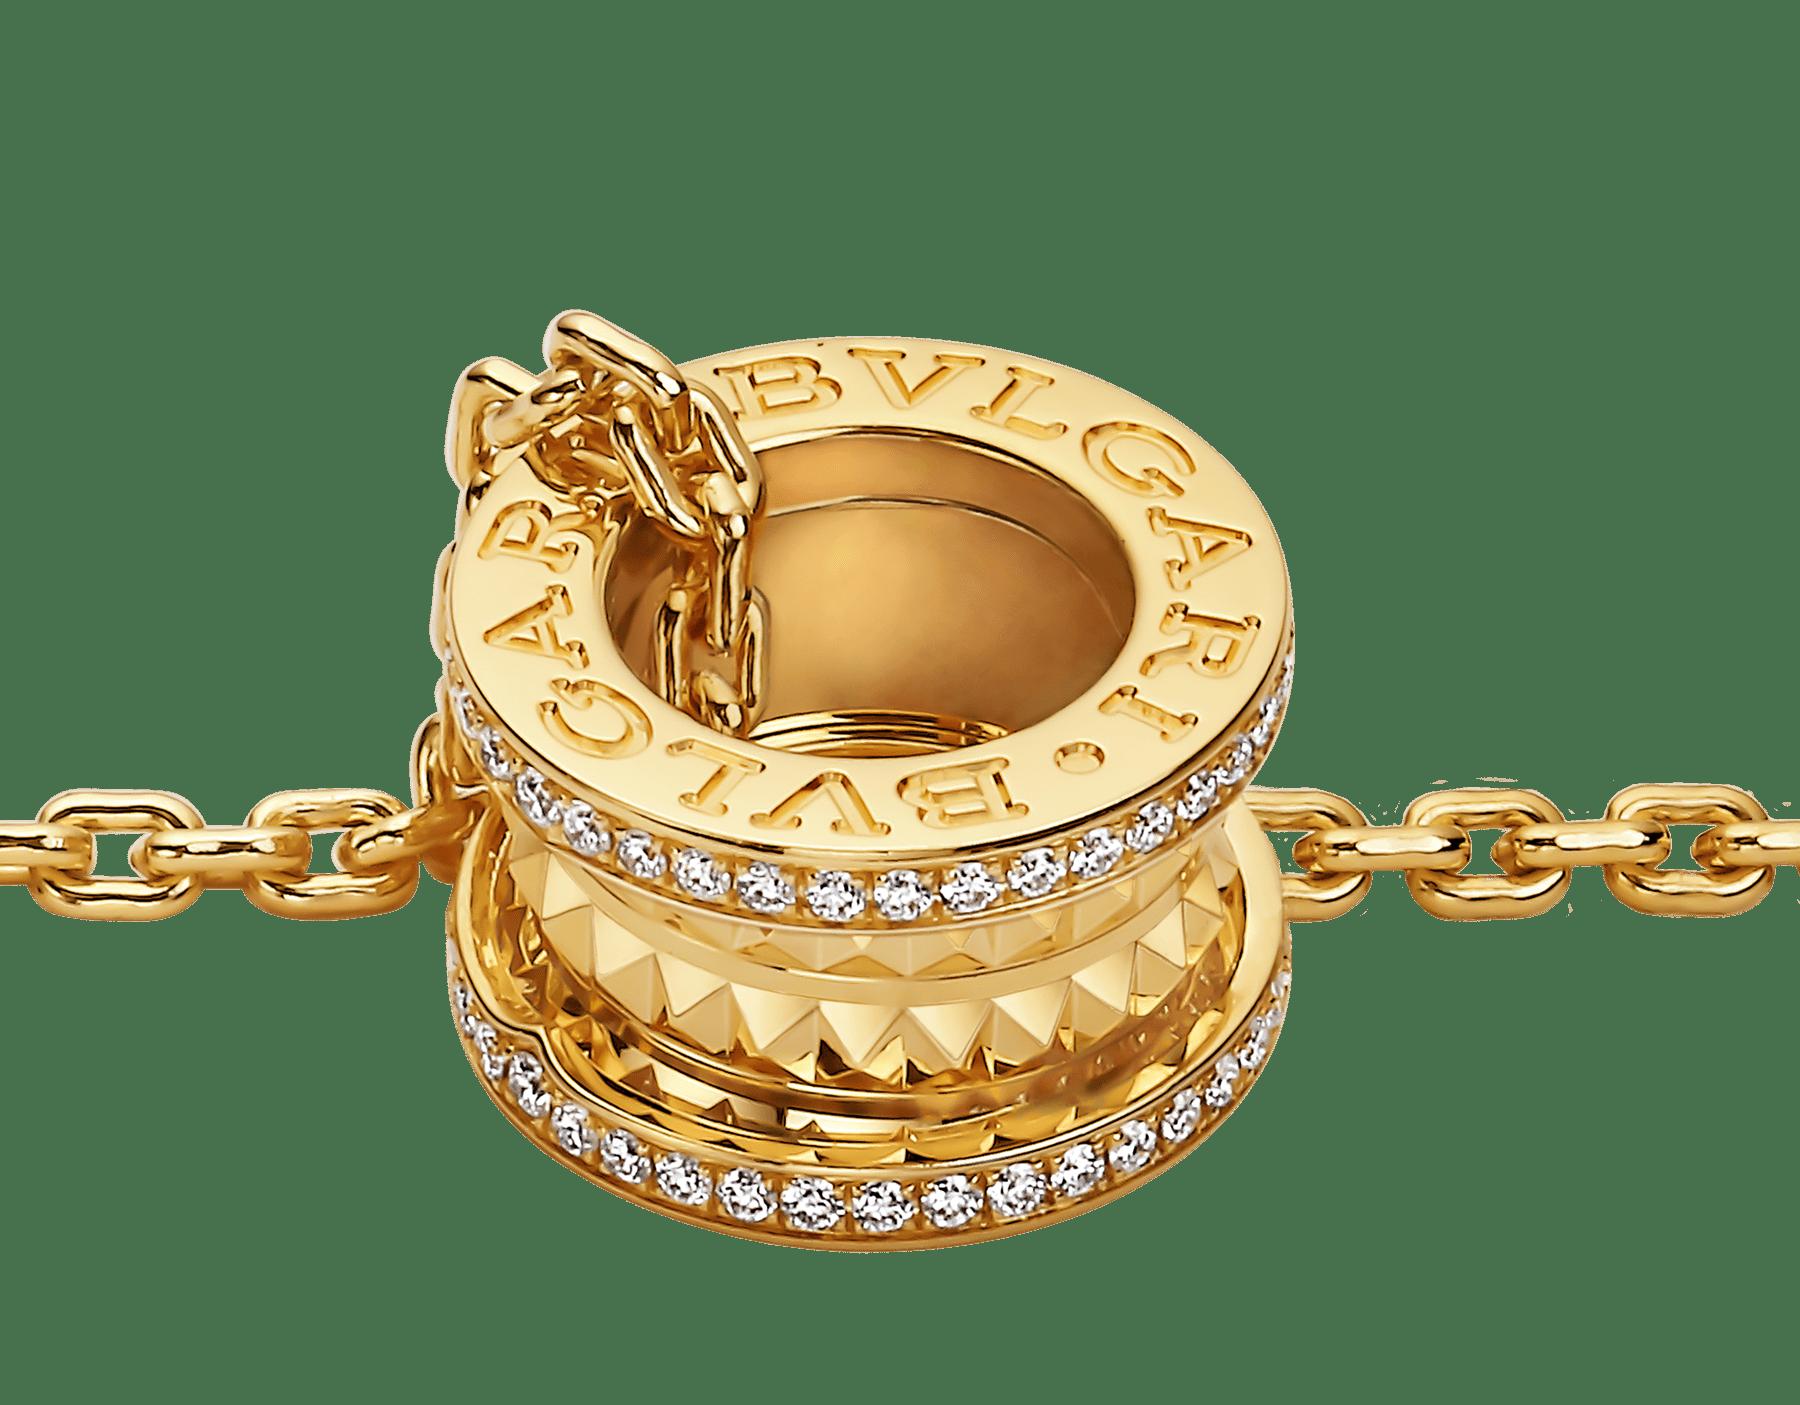 B.zero1 Rock 墜鍊,18K 黃金材質,飾以鉚釘,綴以密鑲鑽石。 358349 image 3